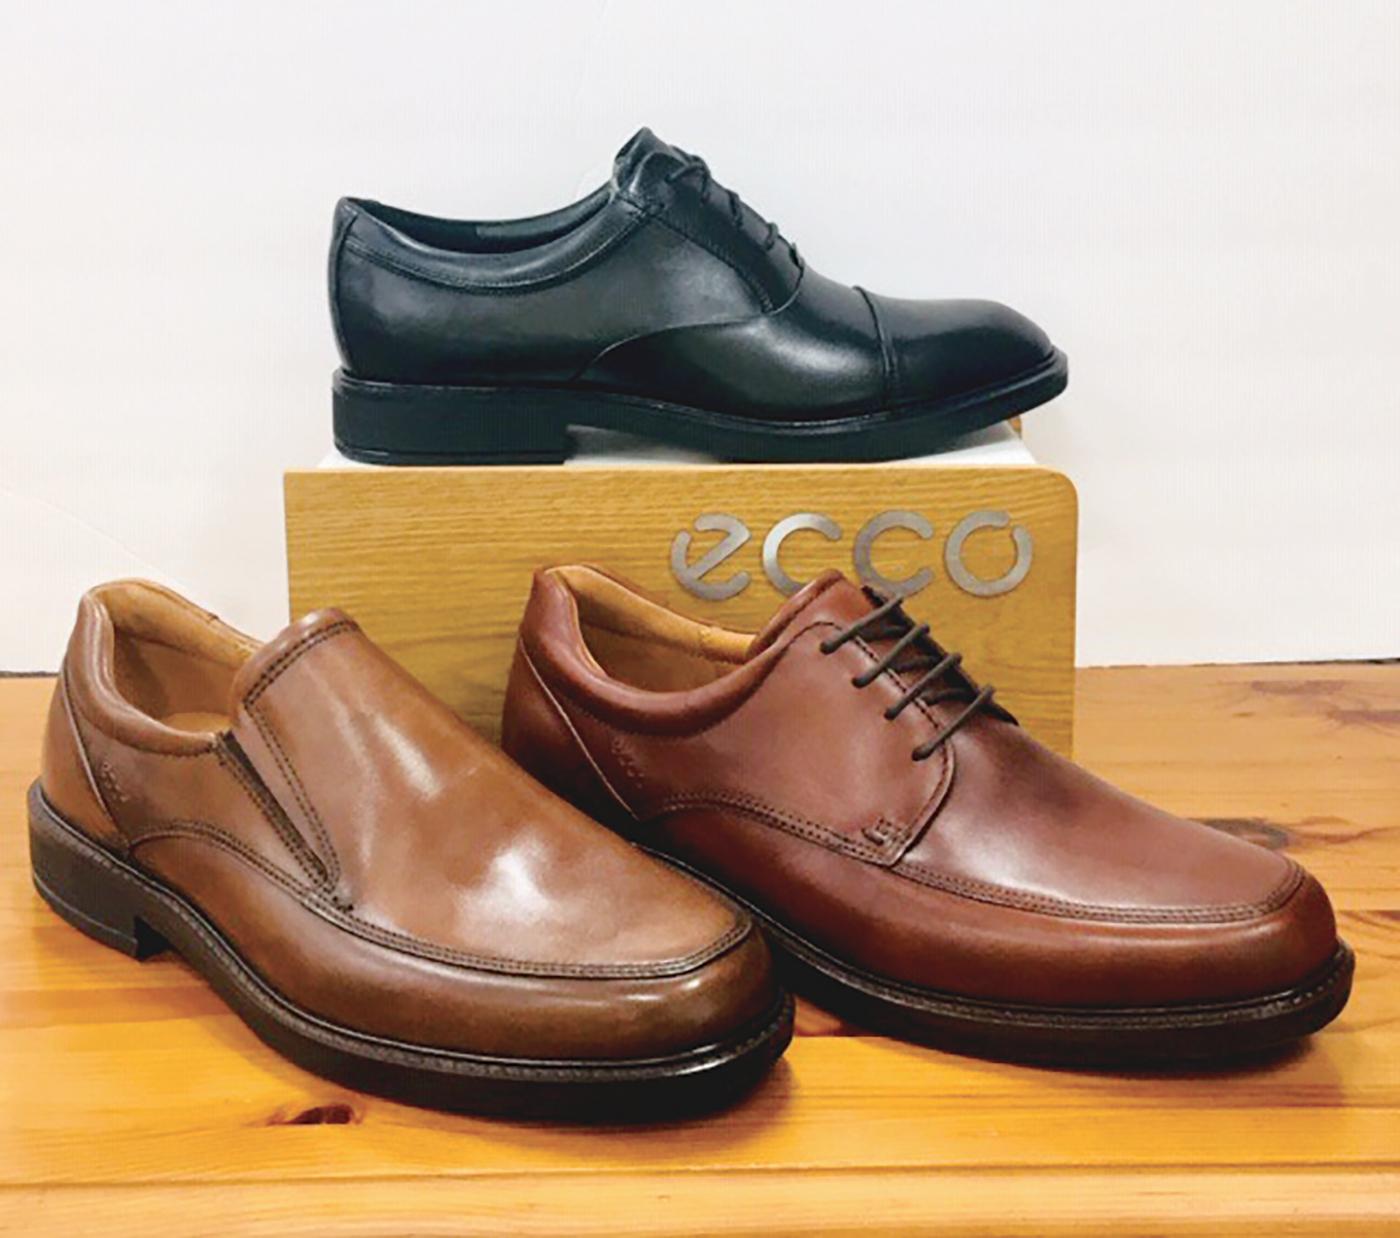 Van Dyke \u0026 Bacon Shoes